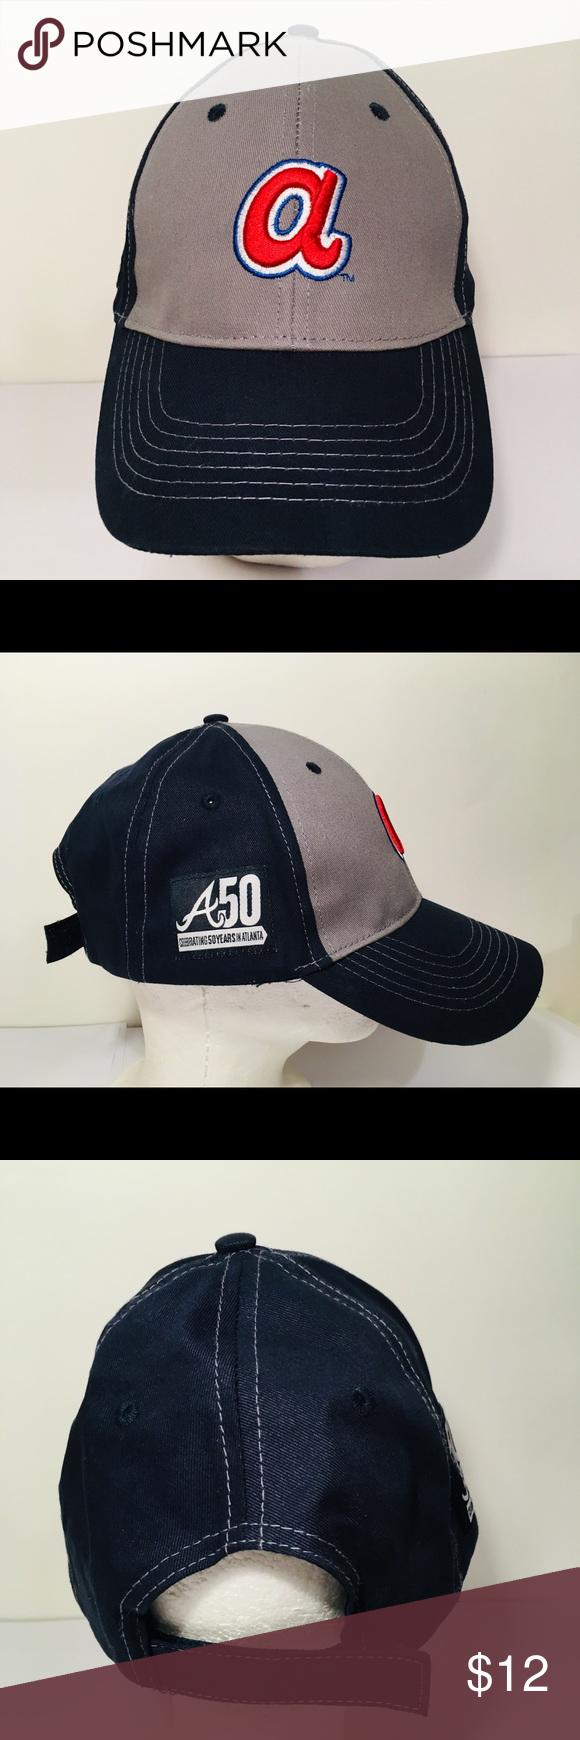 b73a4890283 Atlanta Braves Hat 50 Years in ATL